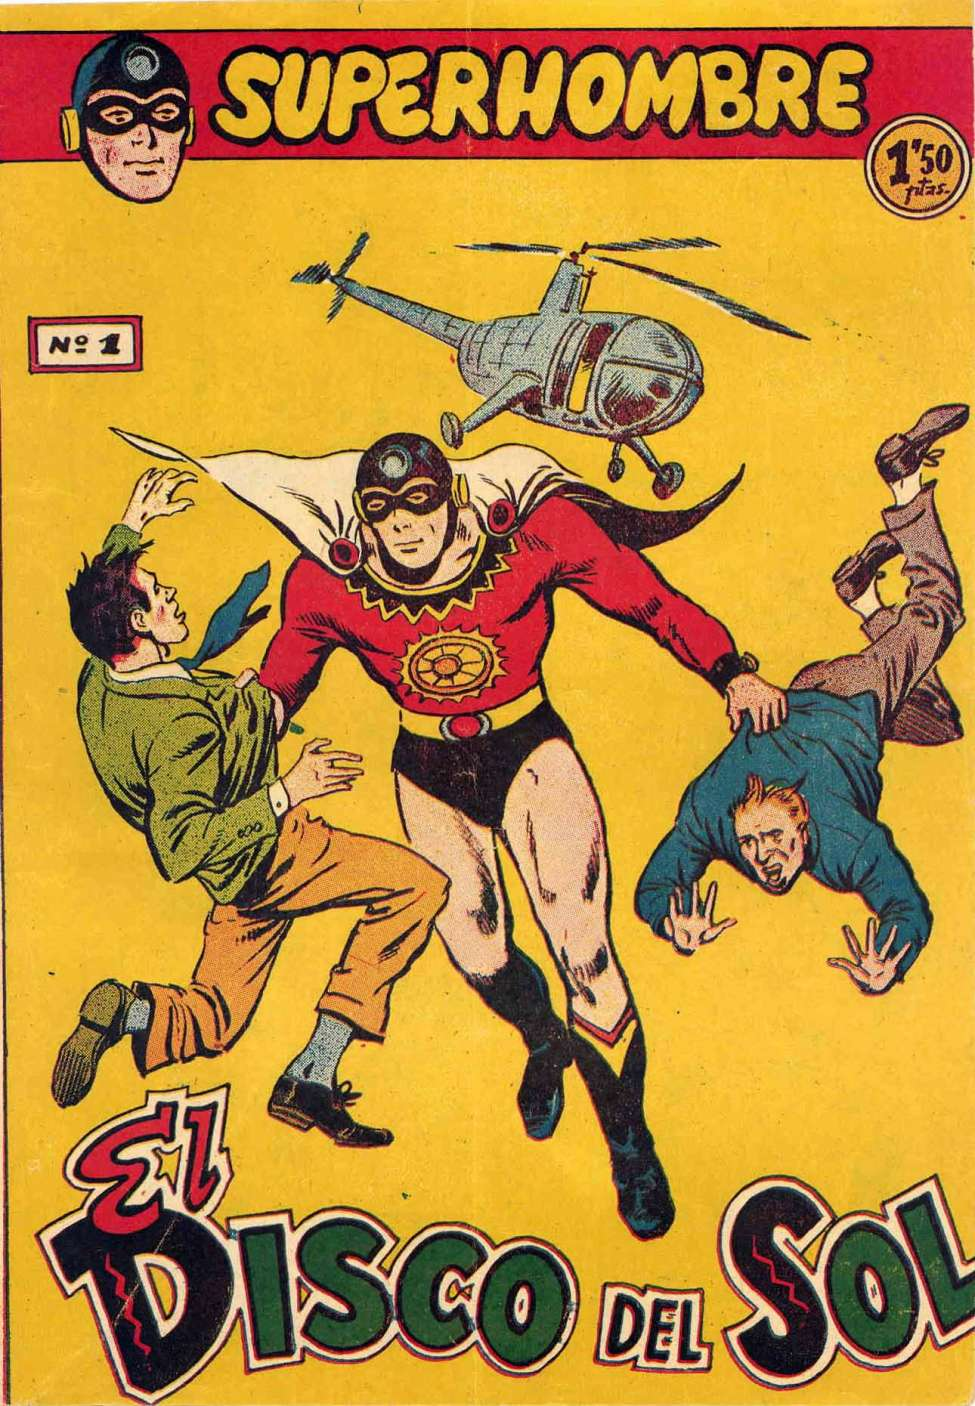 superhombre-comic-book